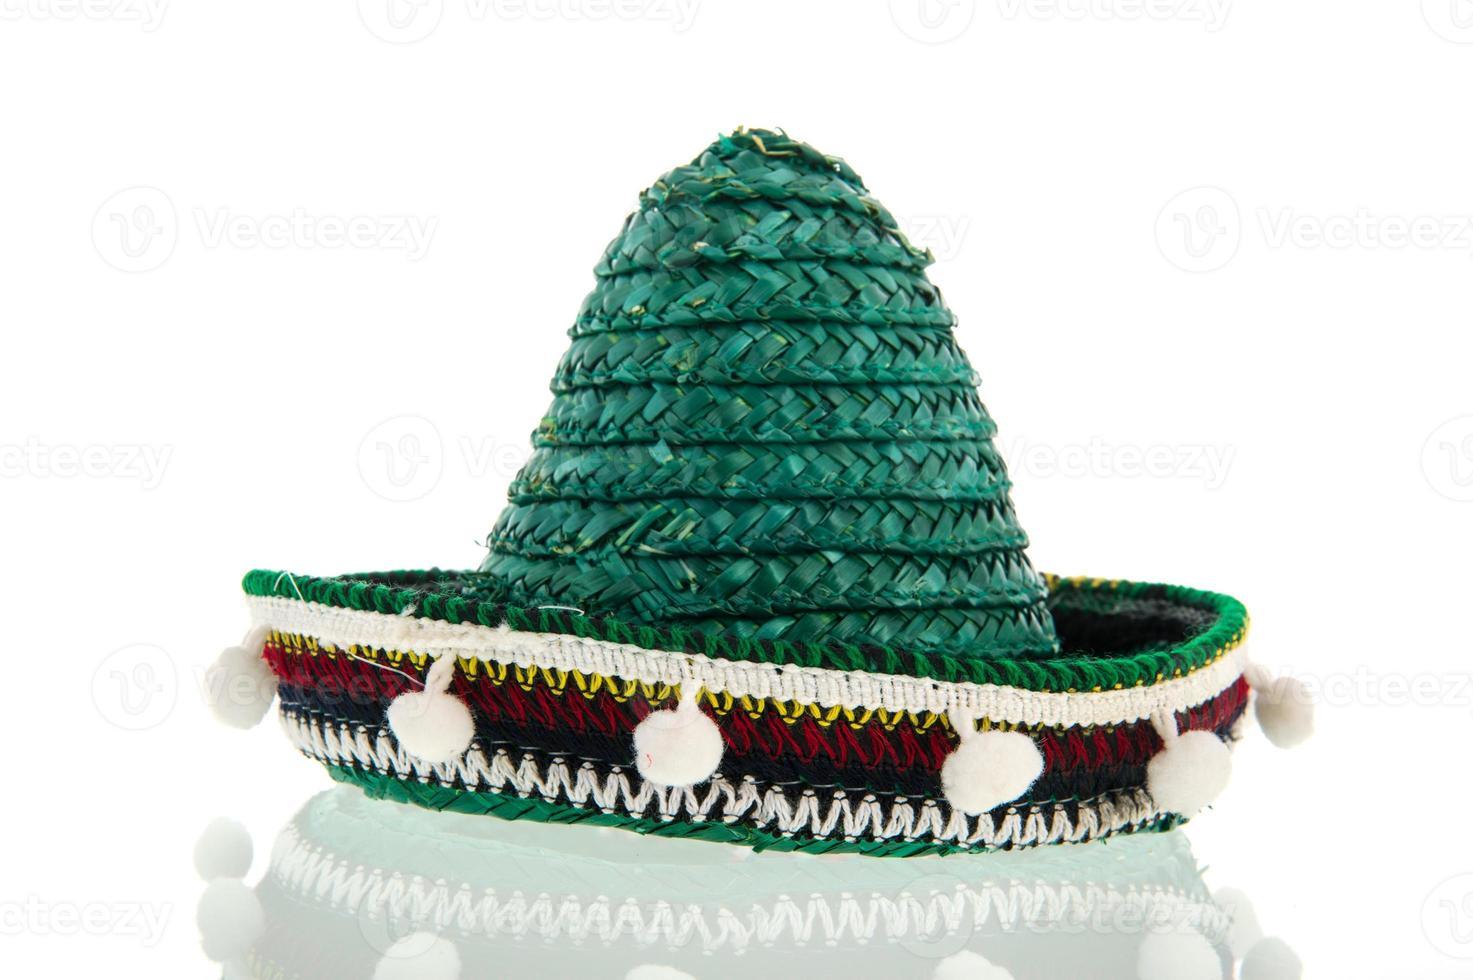 groene sombrero foto